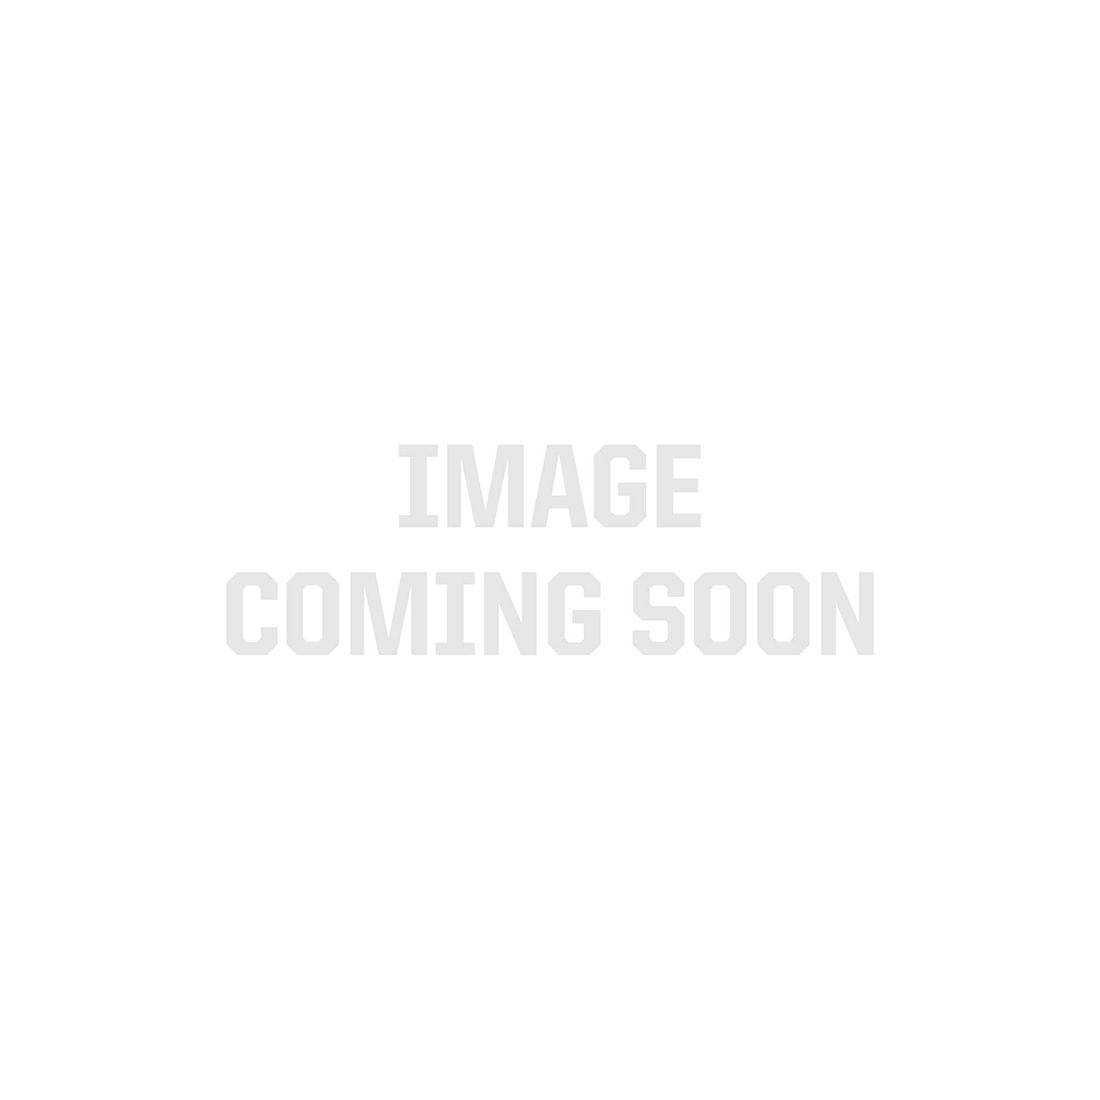 Waterproof Neutral White 3014 Side View LED Strip Light, 96/m, 8mm wide, Sample Kit